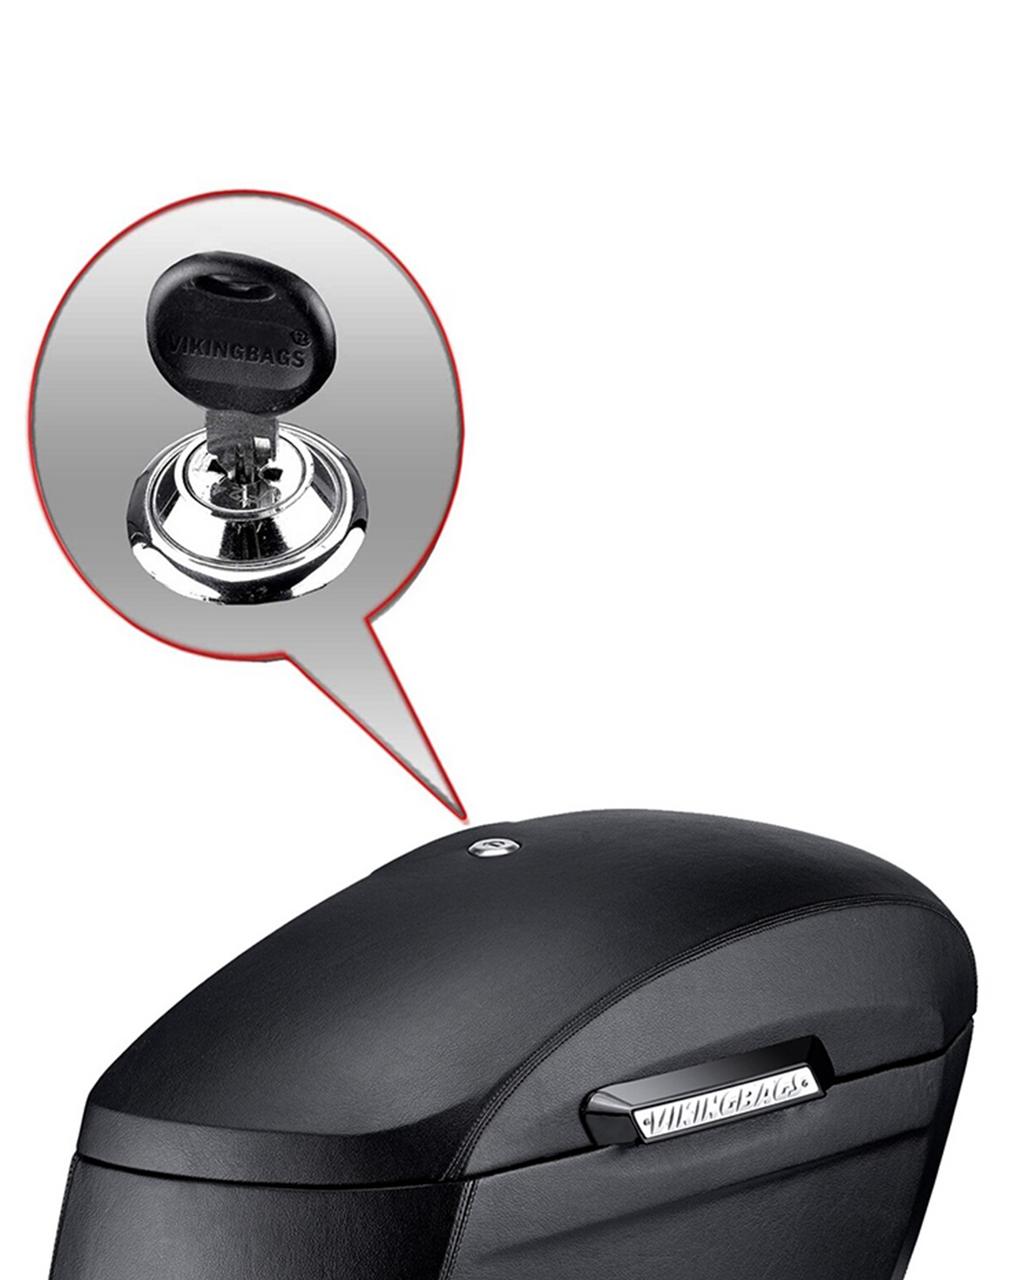 Yamaha V Star 950 Viking Lamellar Extra Large Leather Covered Non-Shock Cutout Saddlebags Key Lockable View